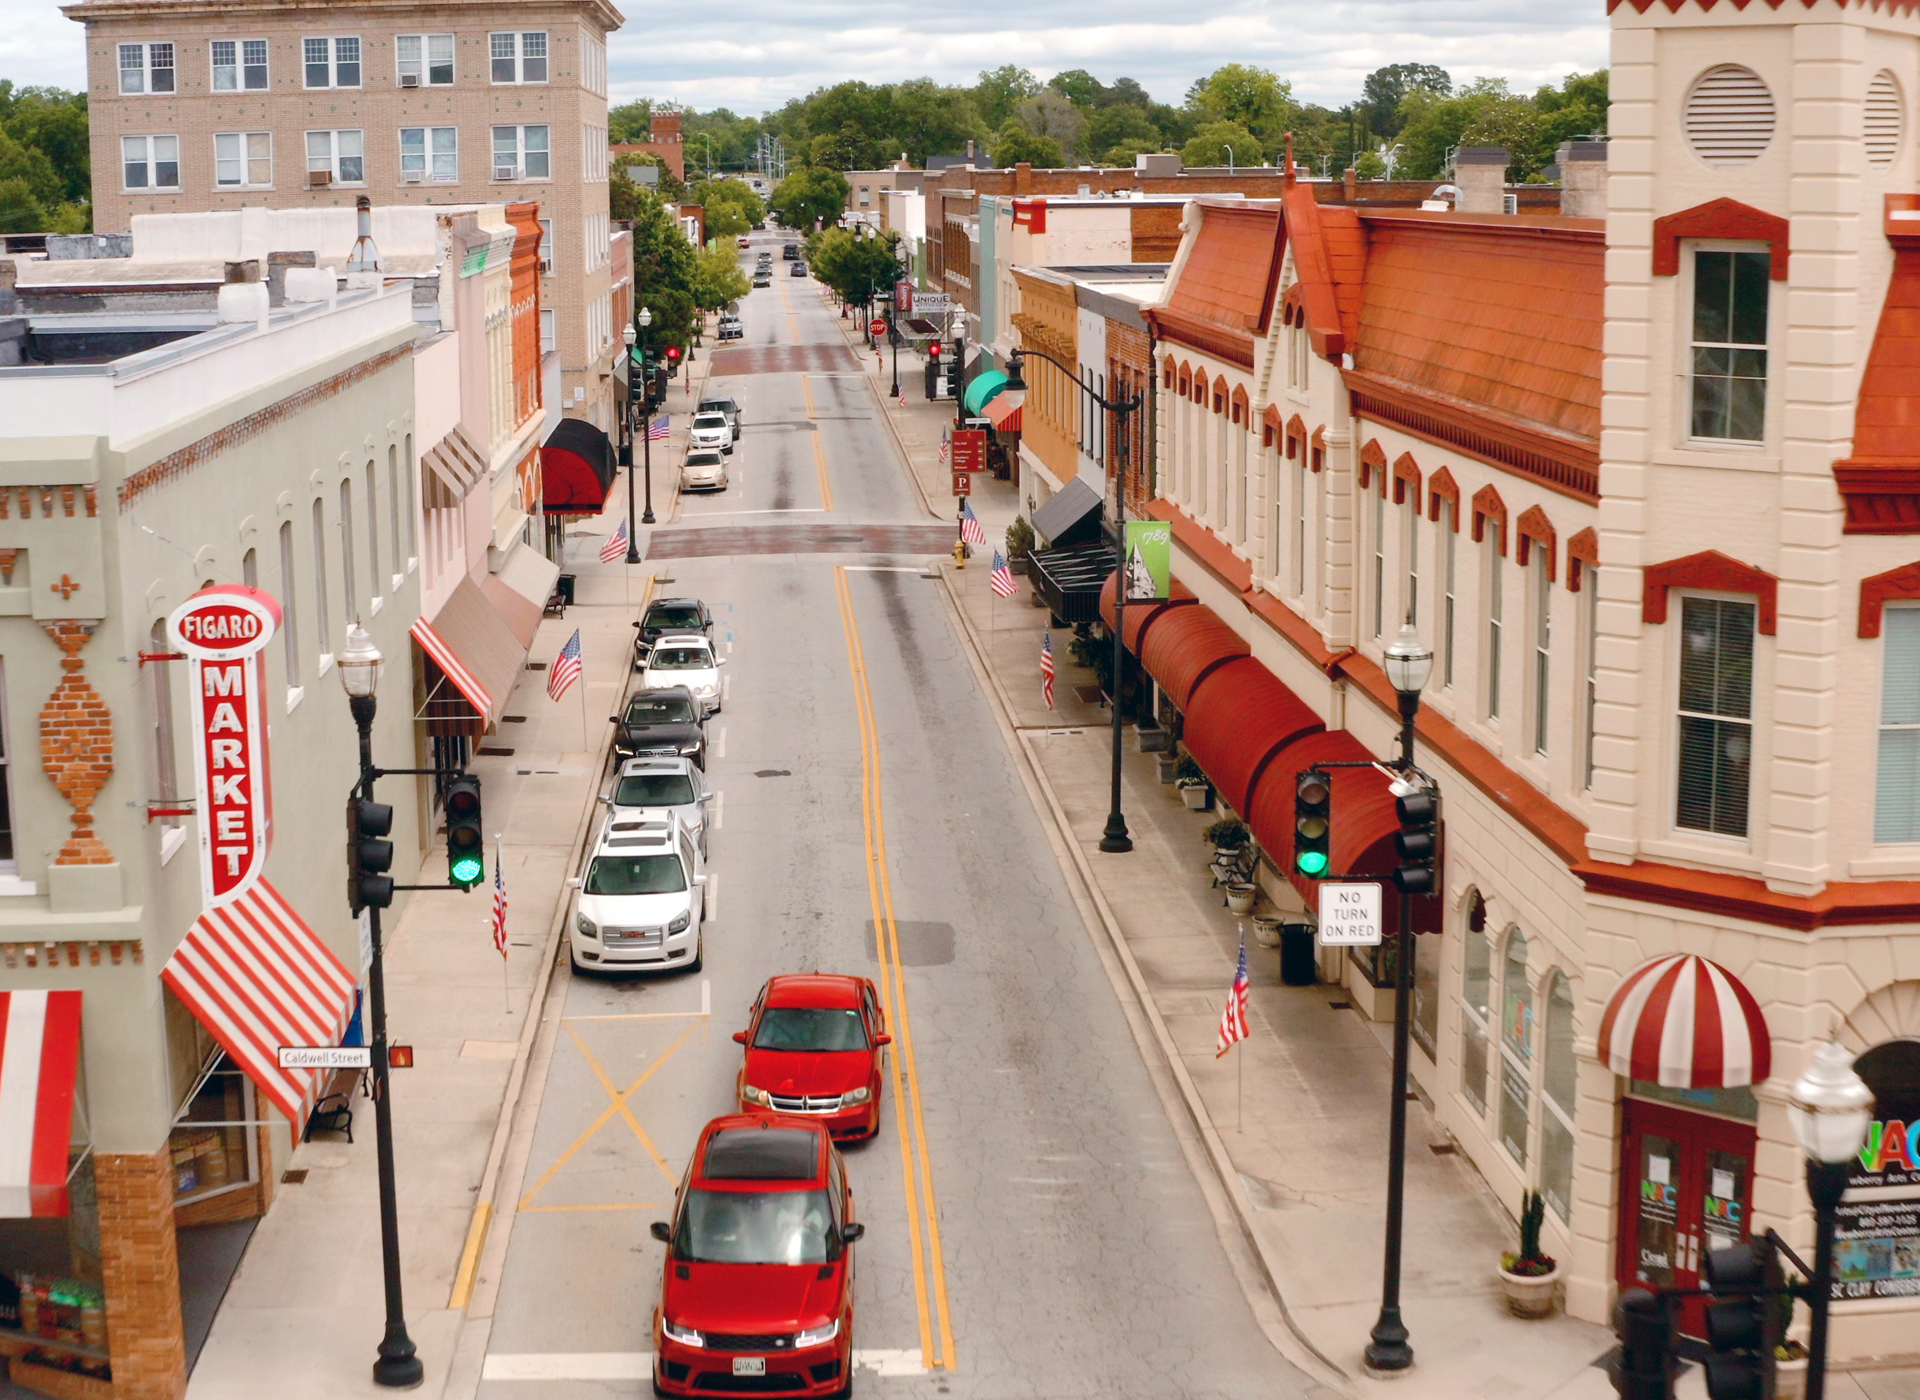 Downtown Newberry, SC     Figaro Market